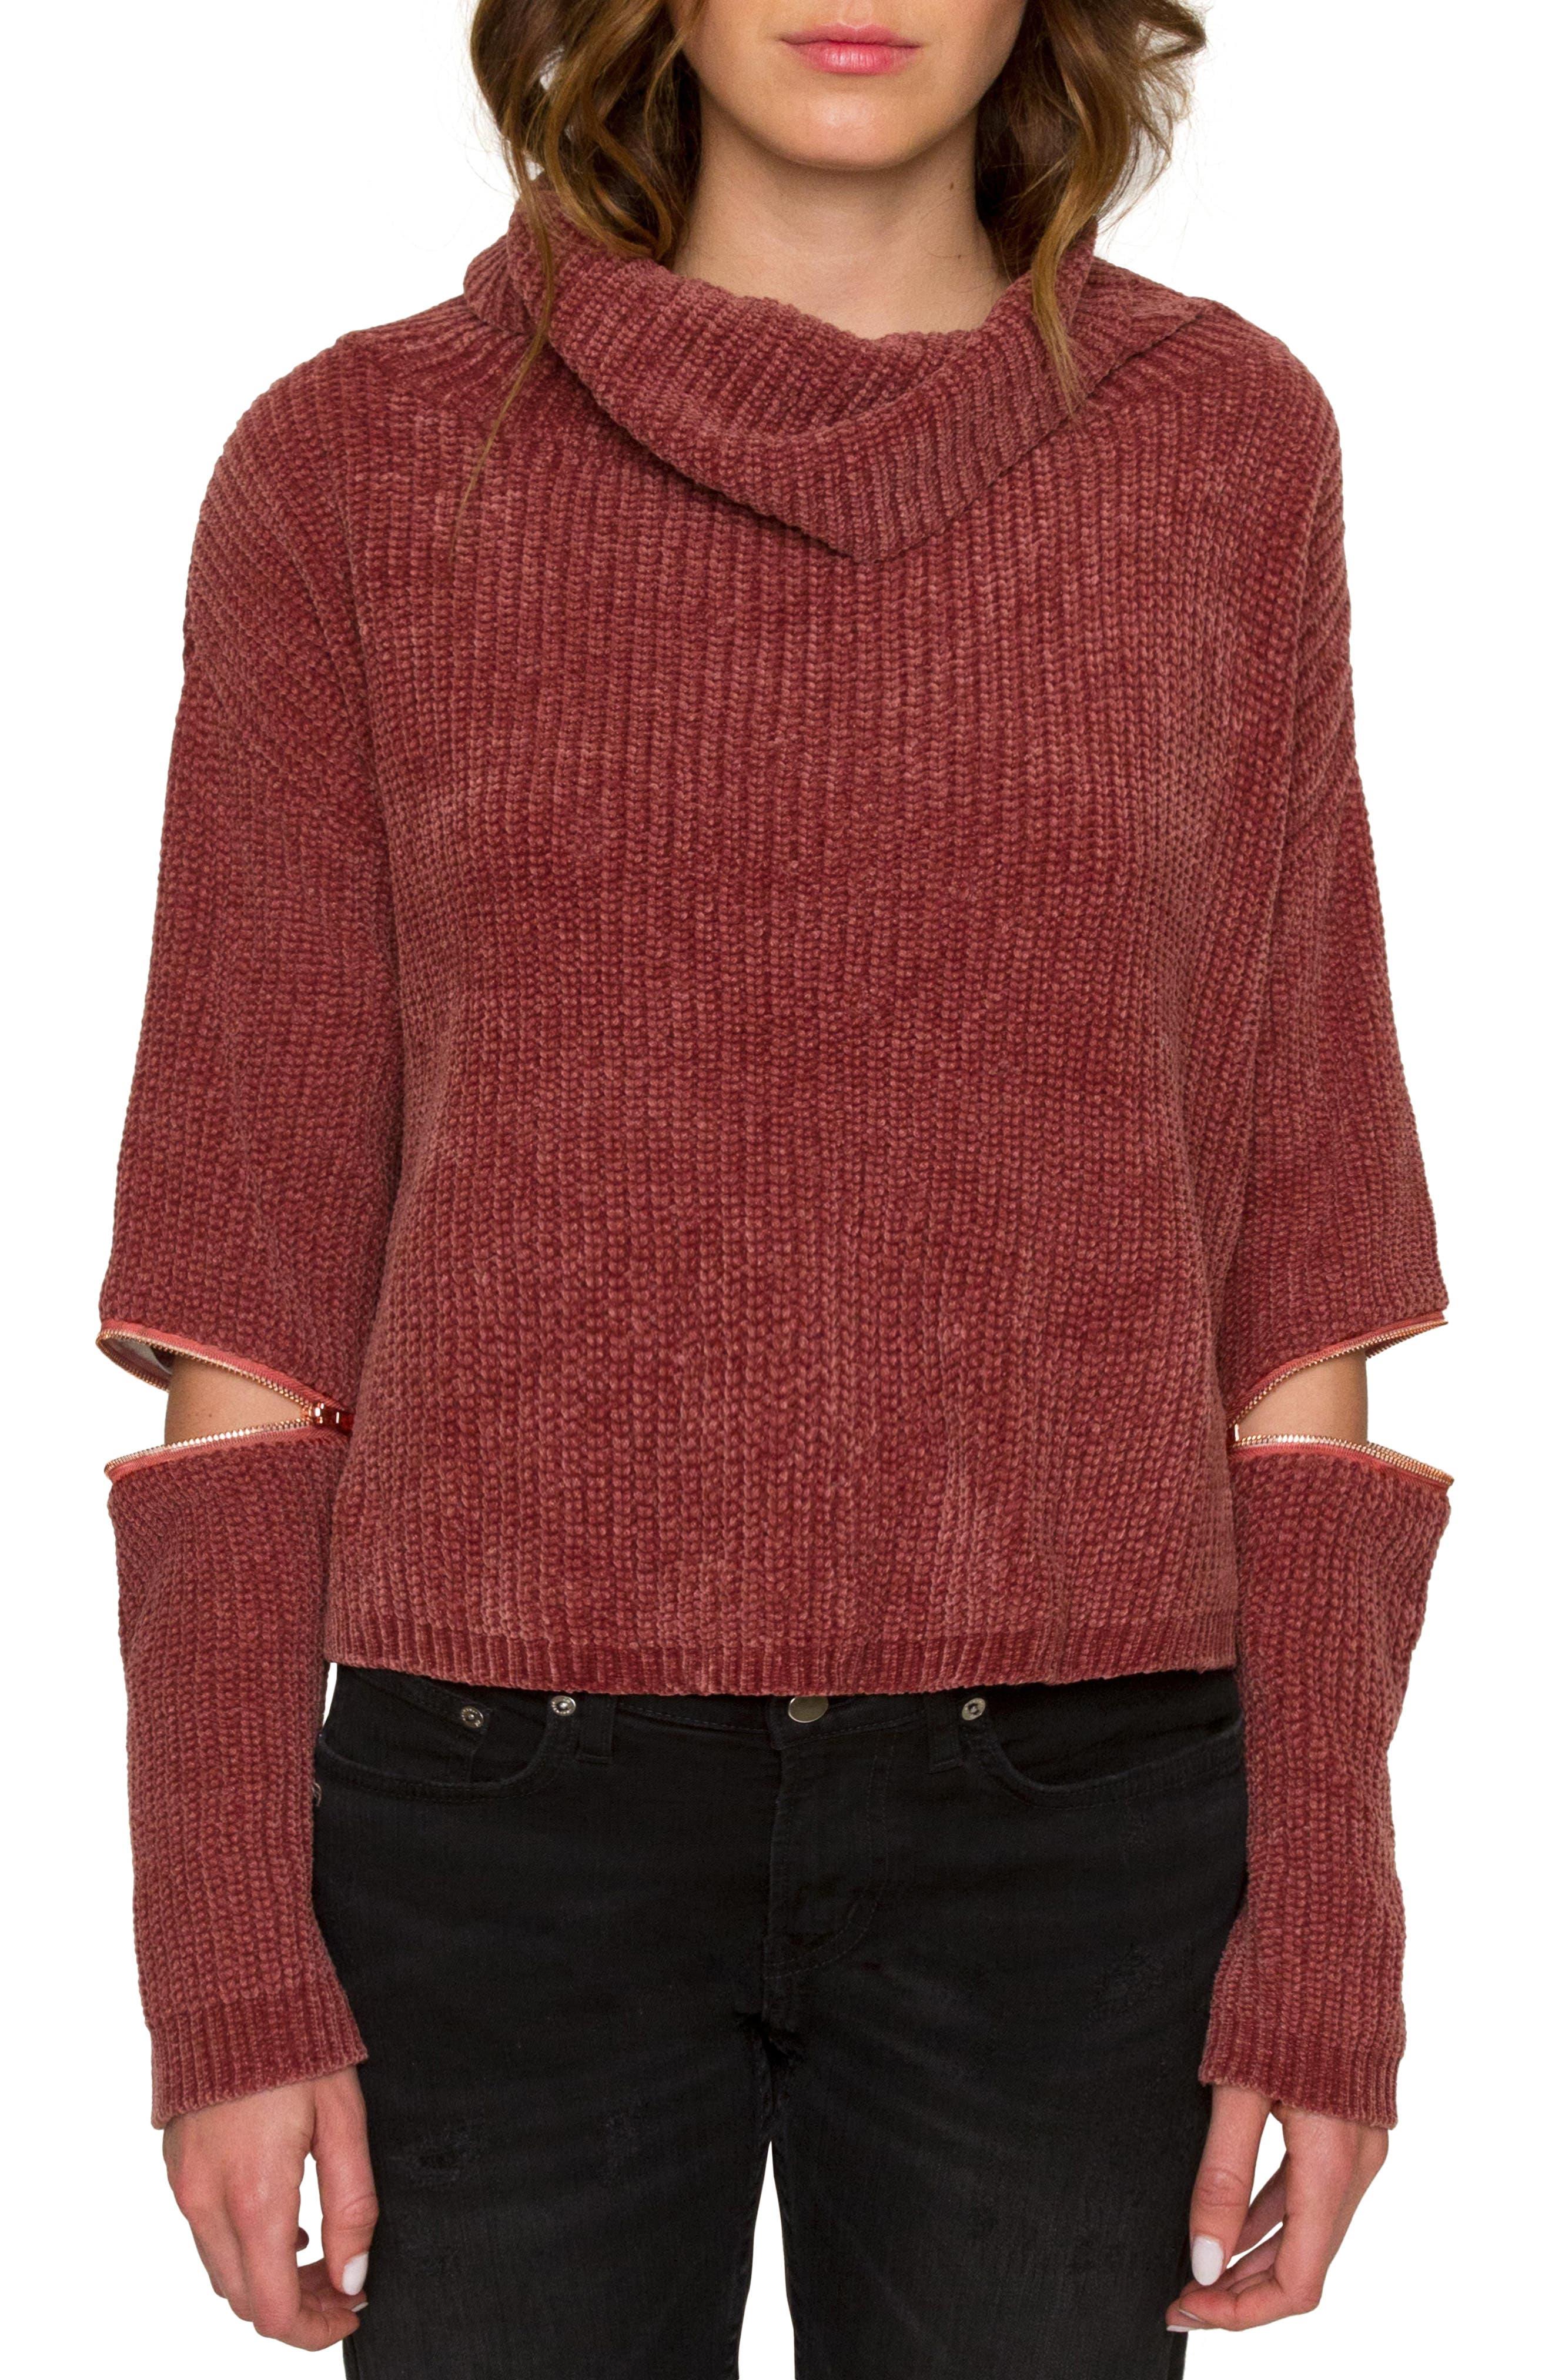 Main Image - Willow & Clay Zip Sleeve Turtleneck Sweater